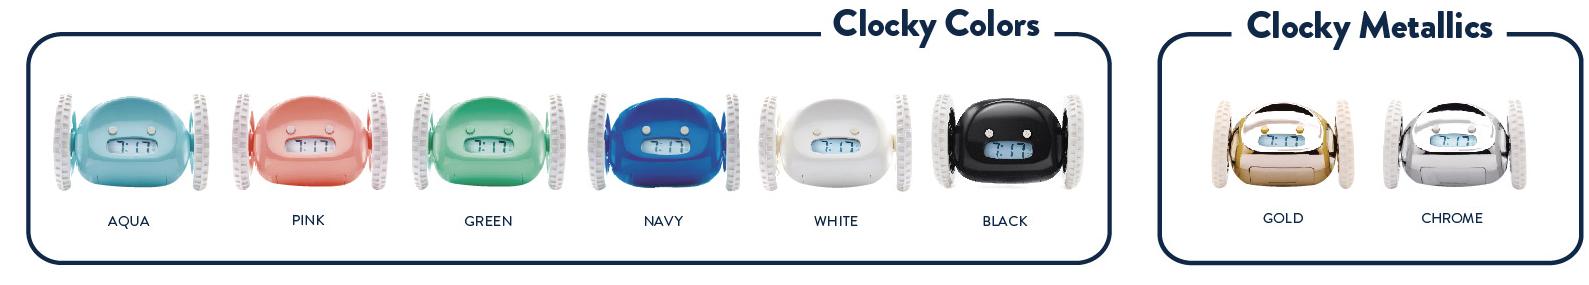 Clocky alarm clock colors